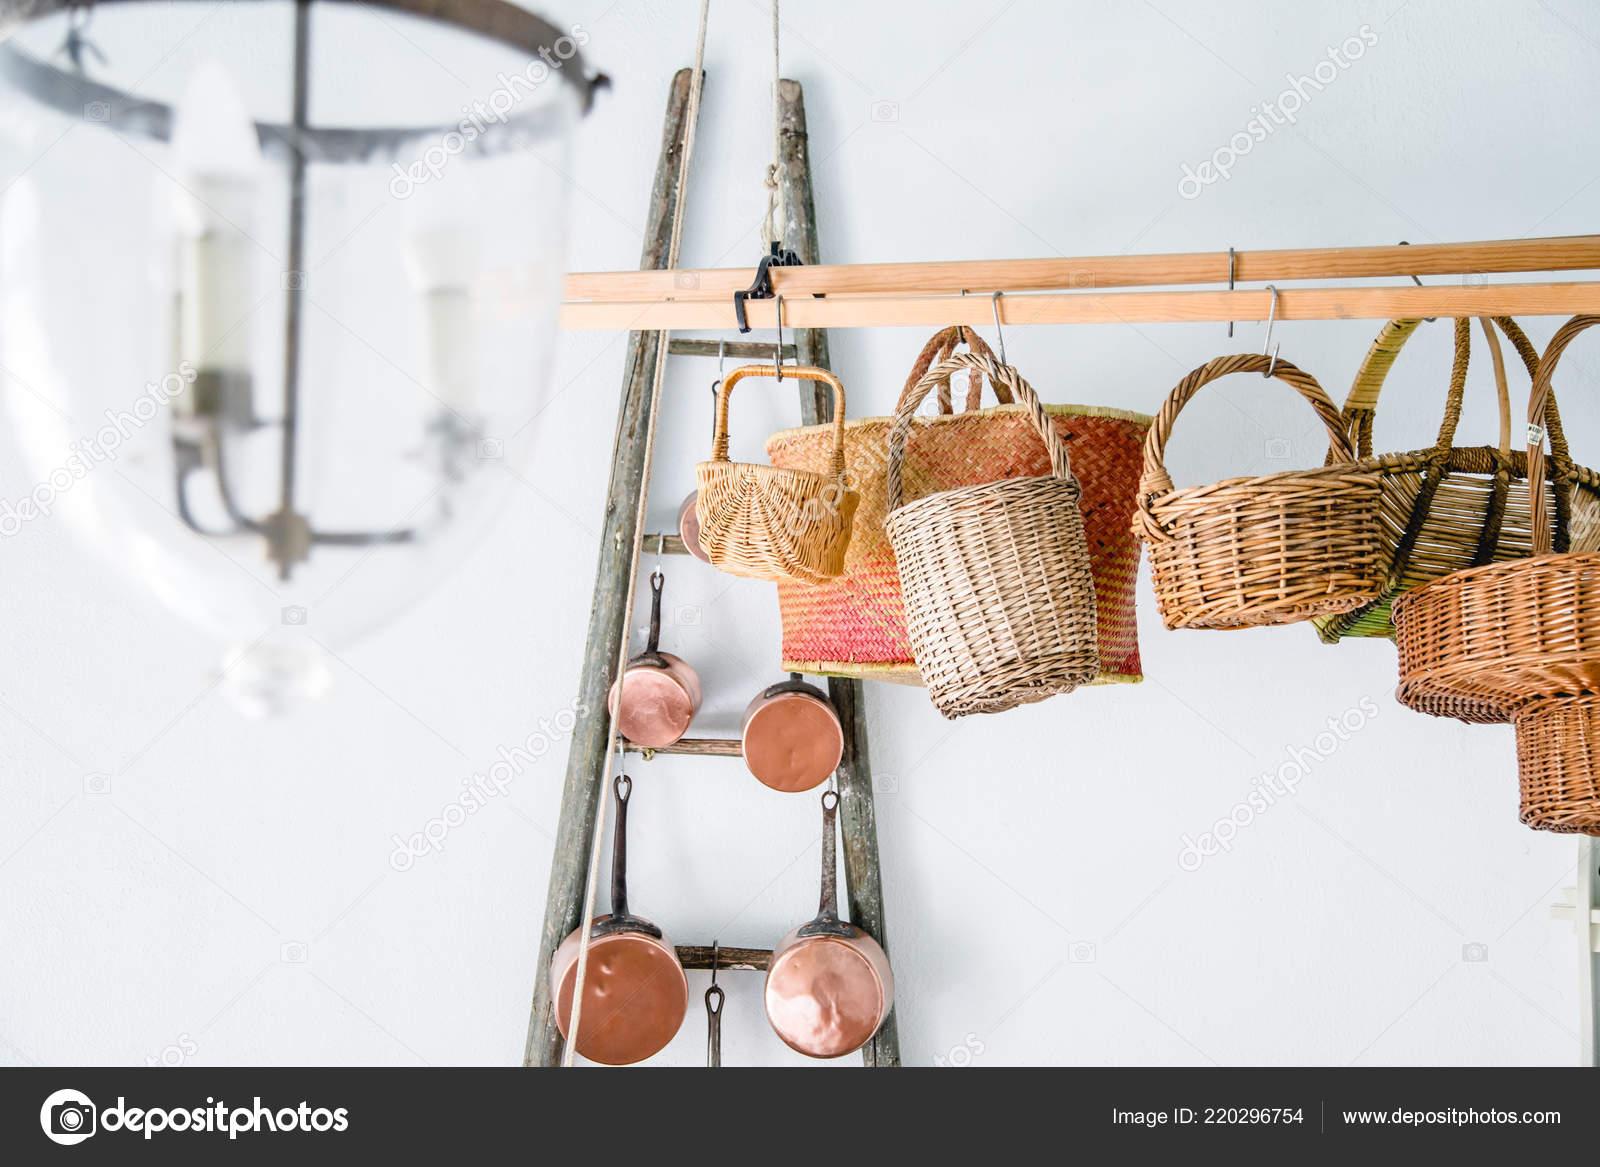 Copper Kitchen Saucepans Baskets Hanging Racks White Wall Stock Photo Image By C Asinskki 220296754